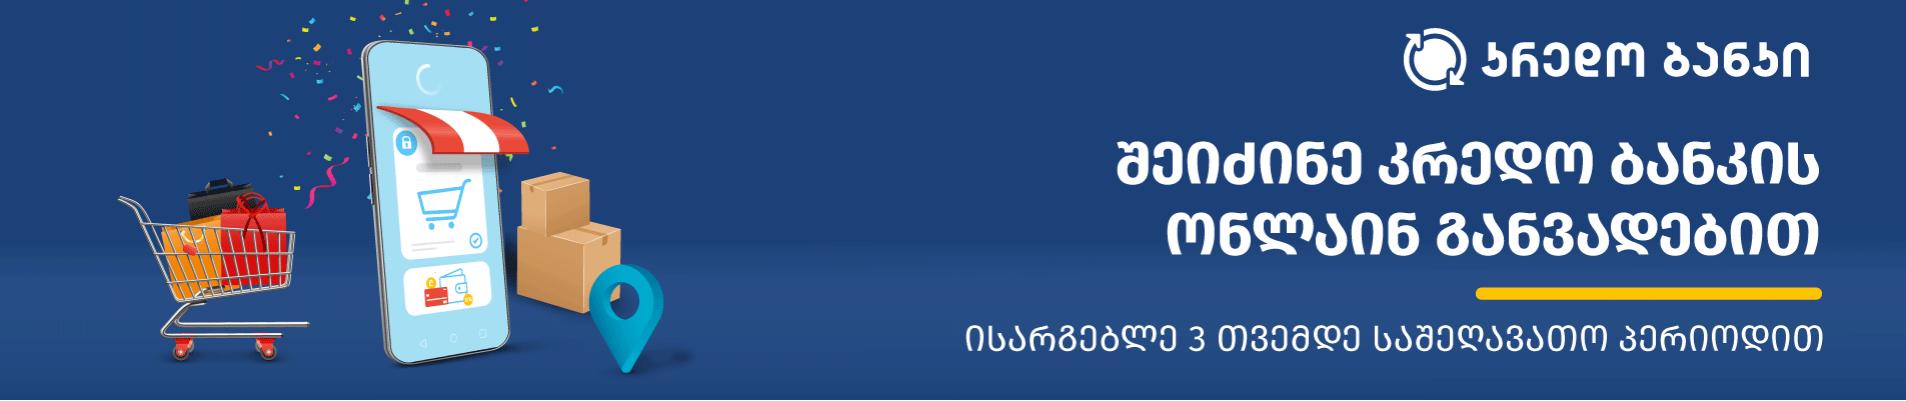 Online loan from Bank Credo